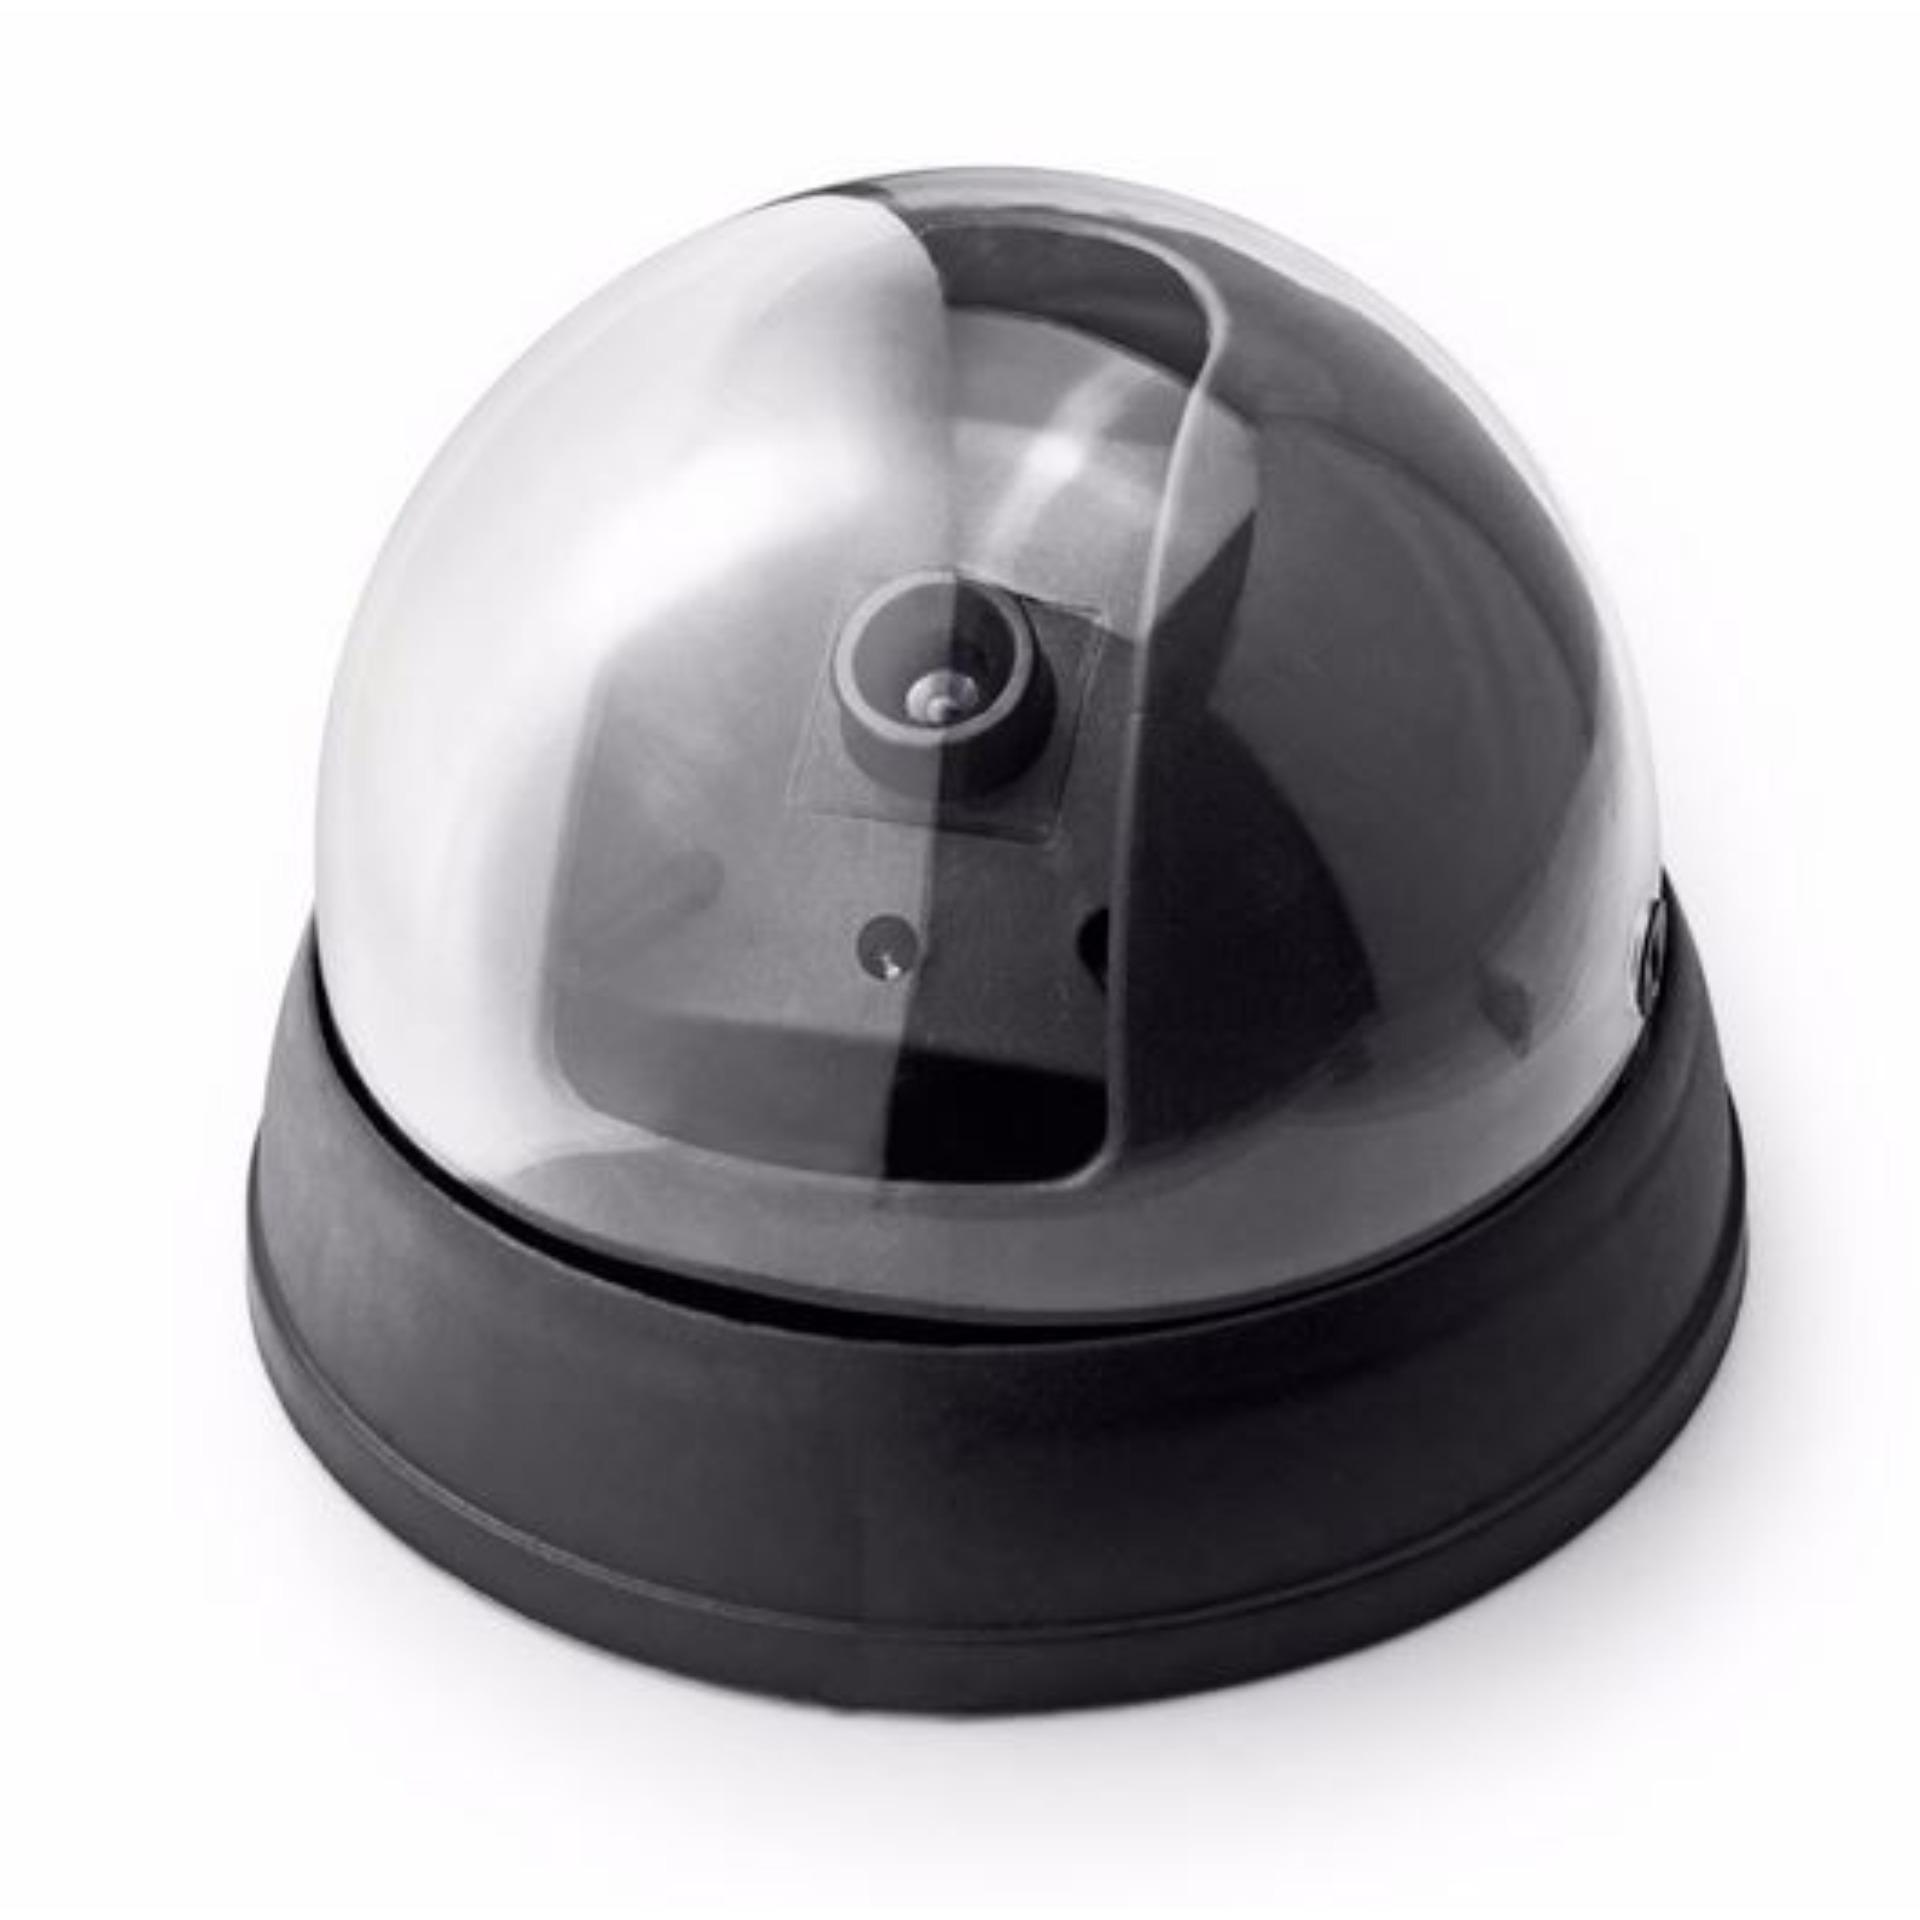 Tanpa Kabel Unique Dummy CCTV LED Light - Replica Dome CCTV - CCTV Palsu - Fake Kamera CCTV